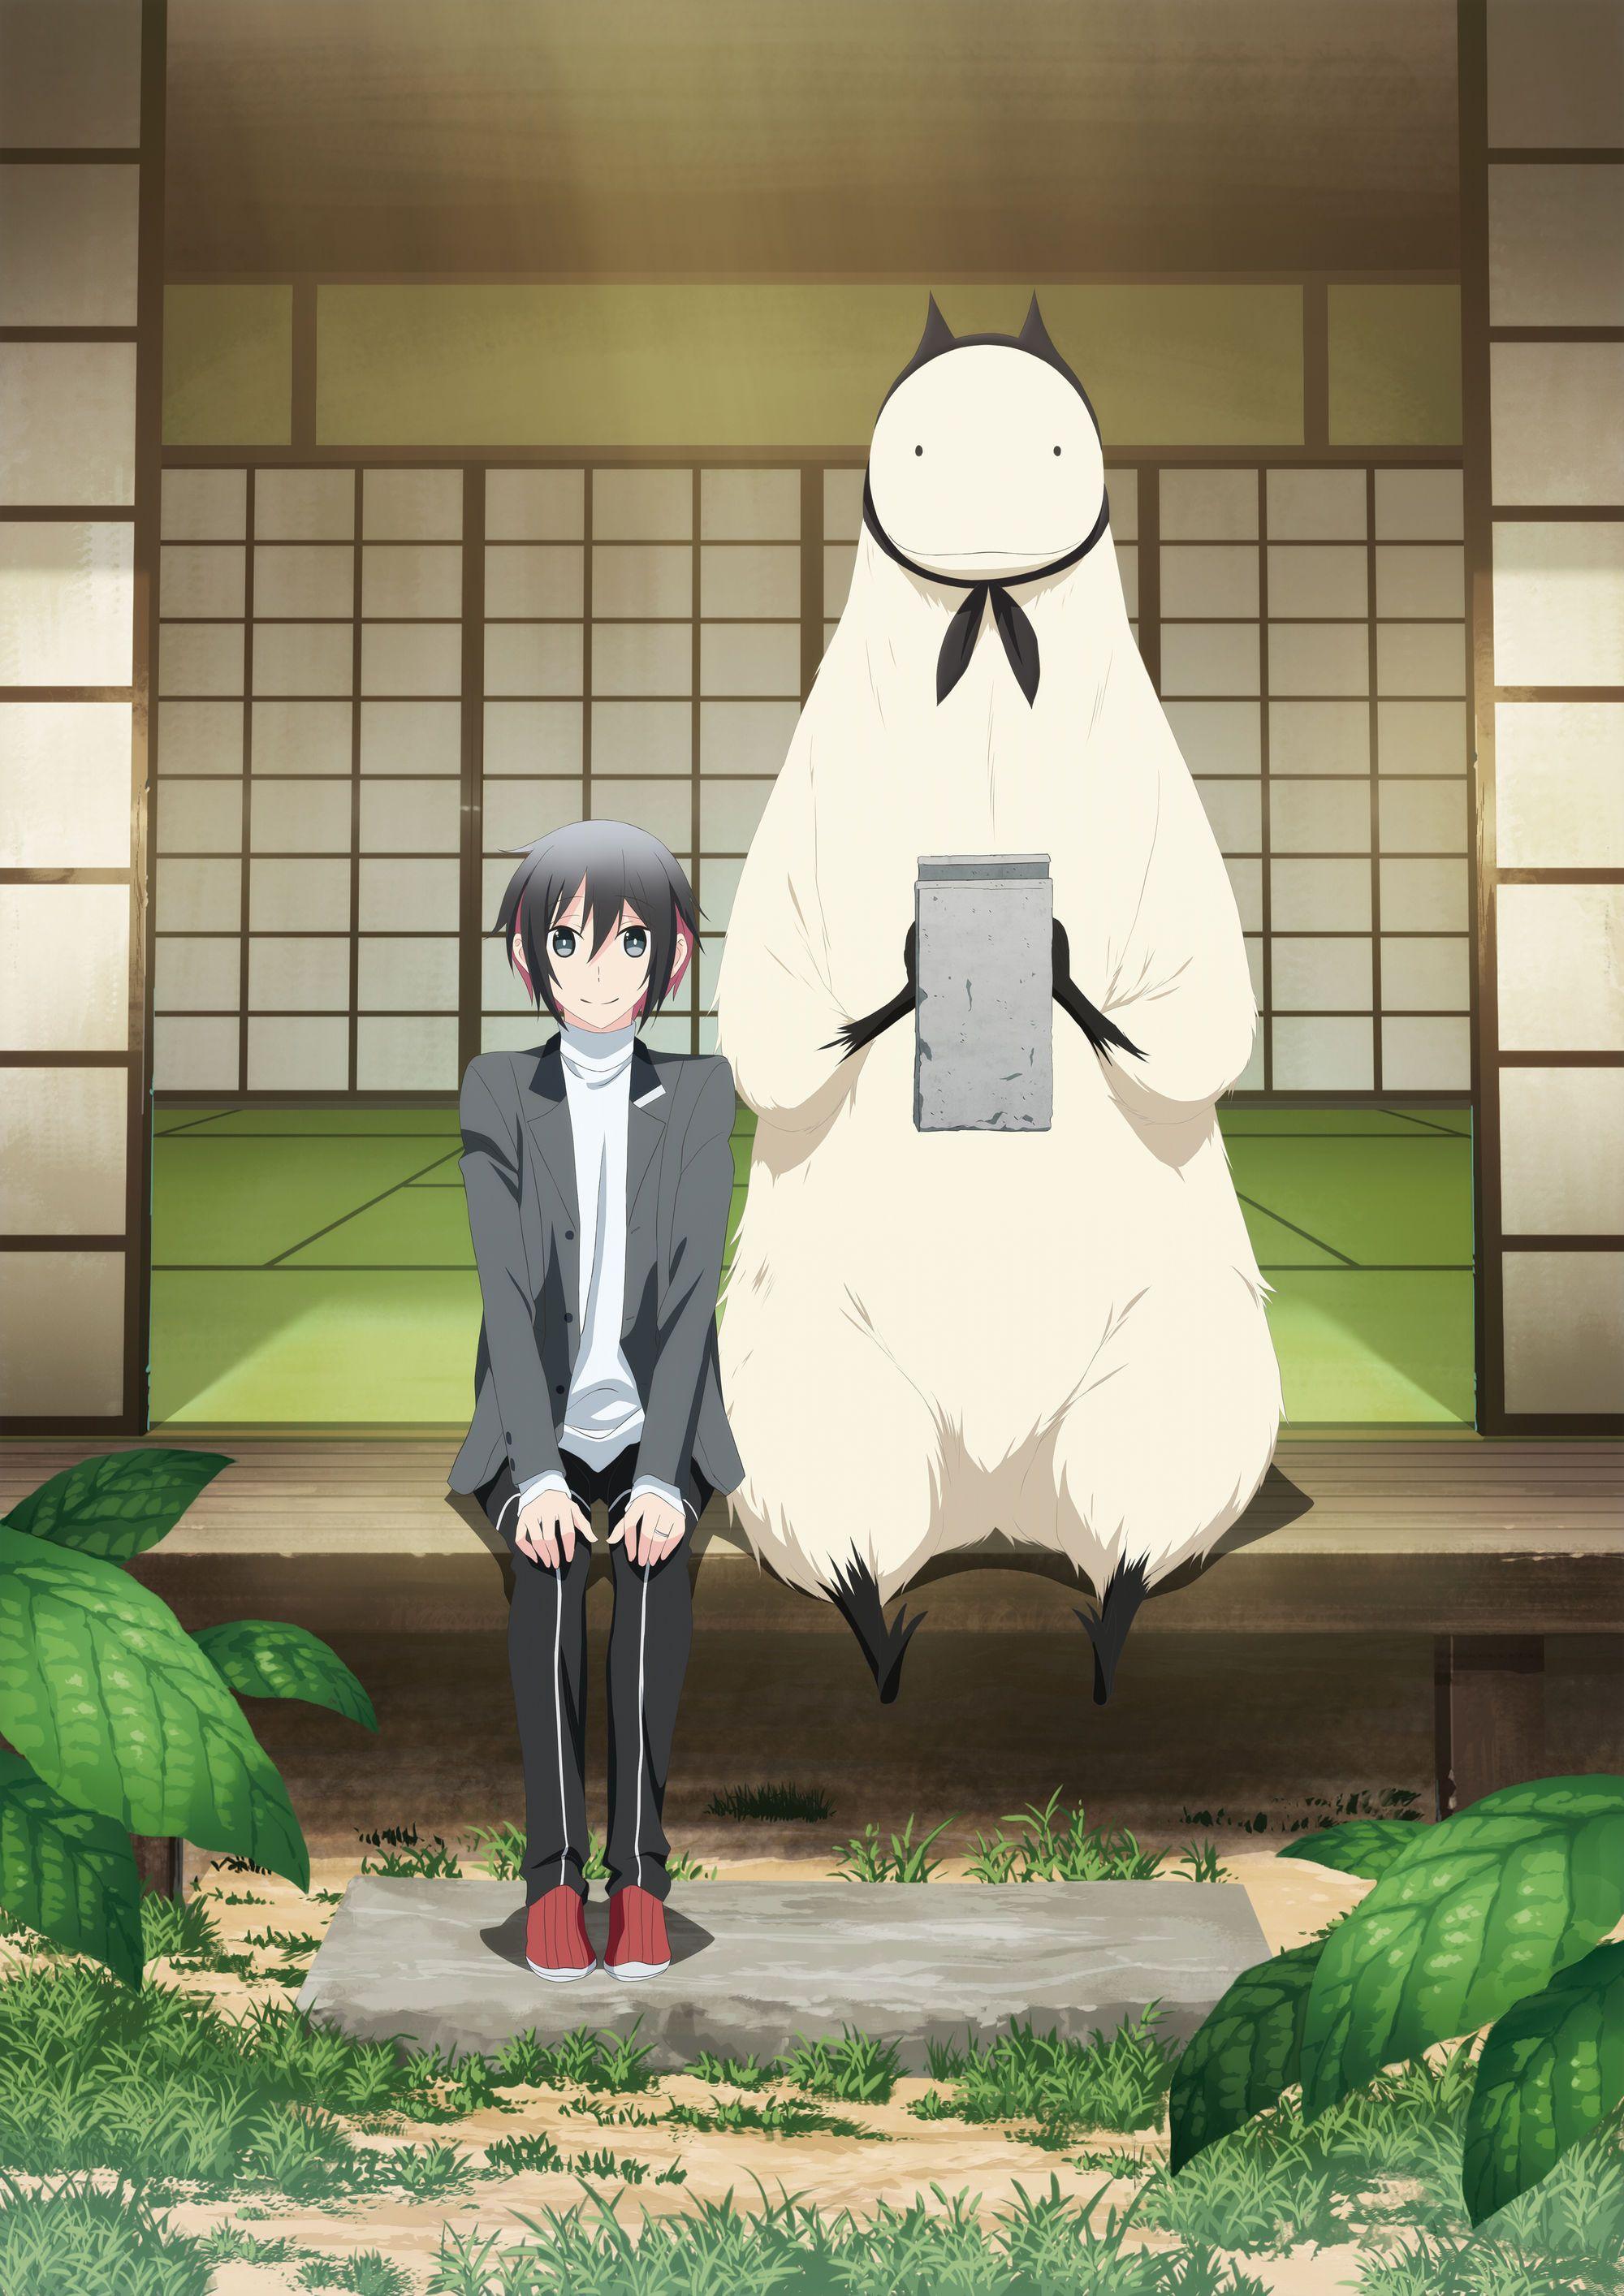 Jingaisan no Yome 01 12 Anime, Anime nerd, Anime angel